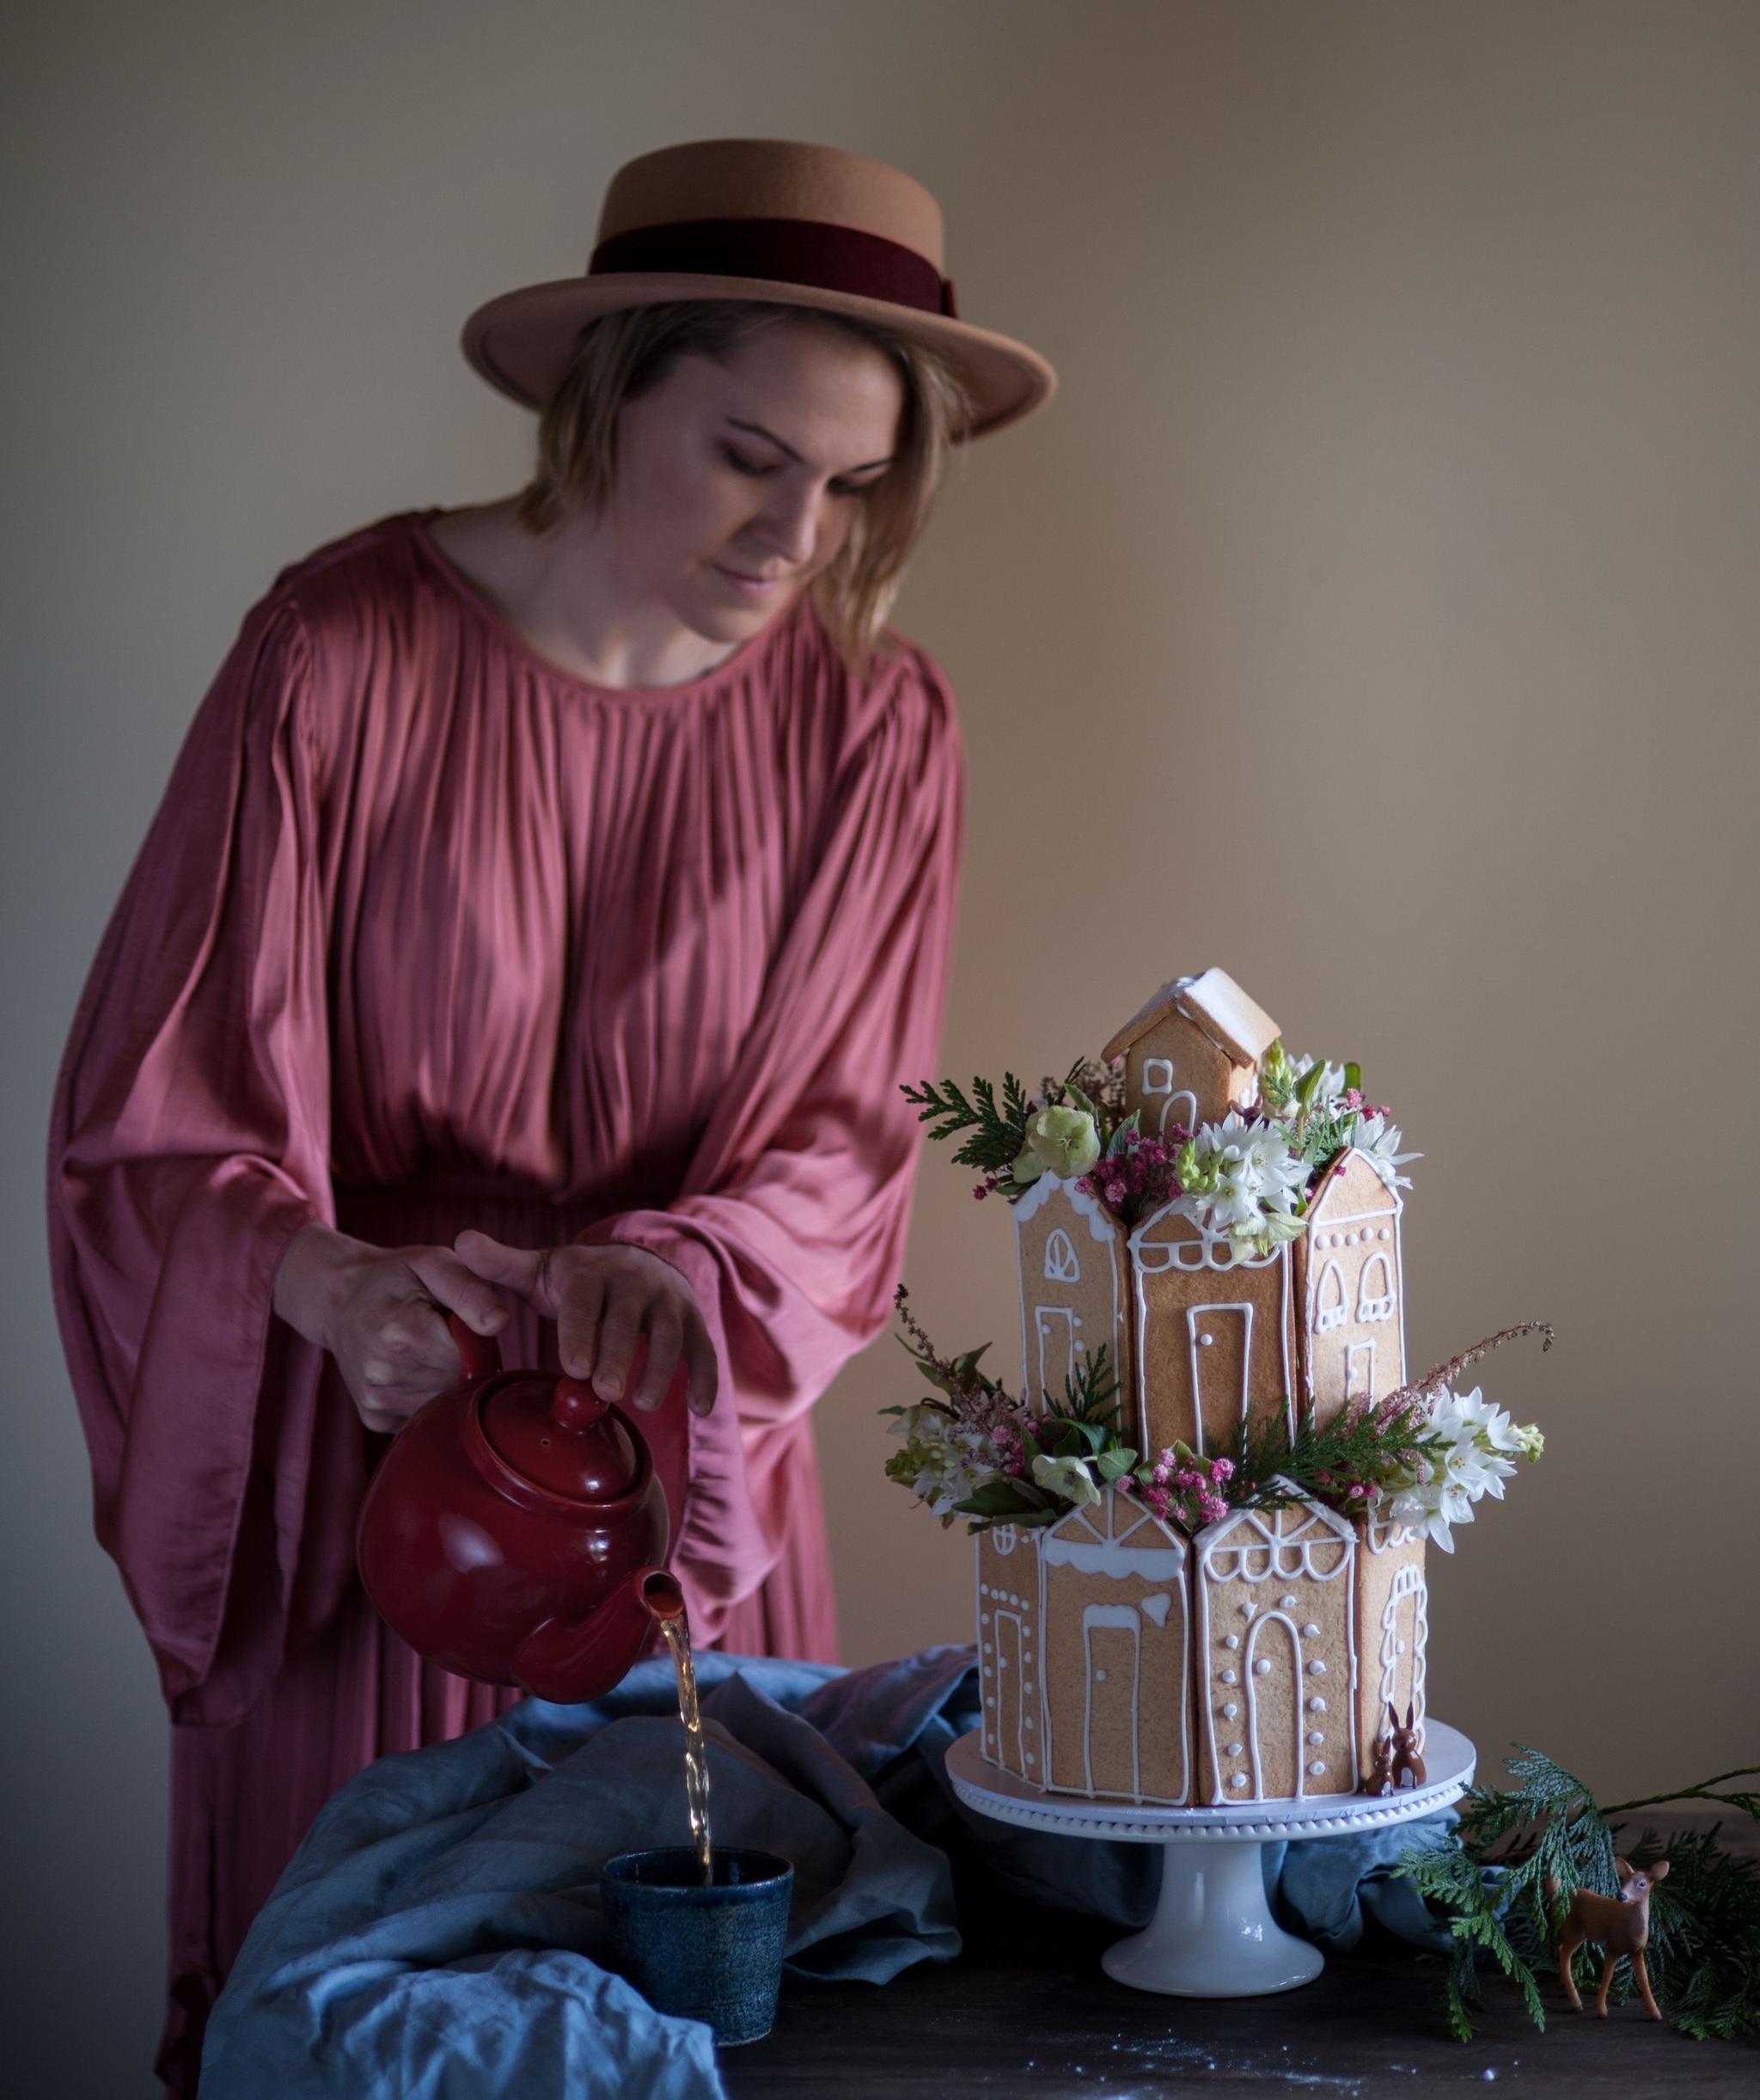 cherry-cakes-shoot-17-009.jpg